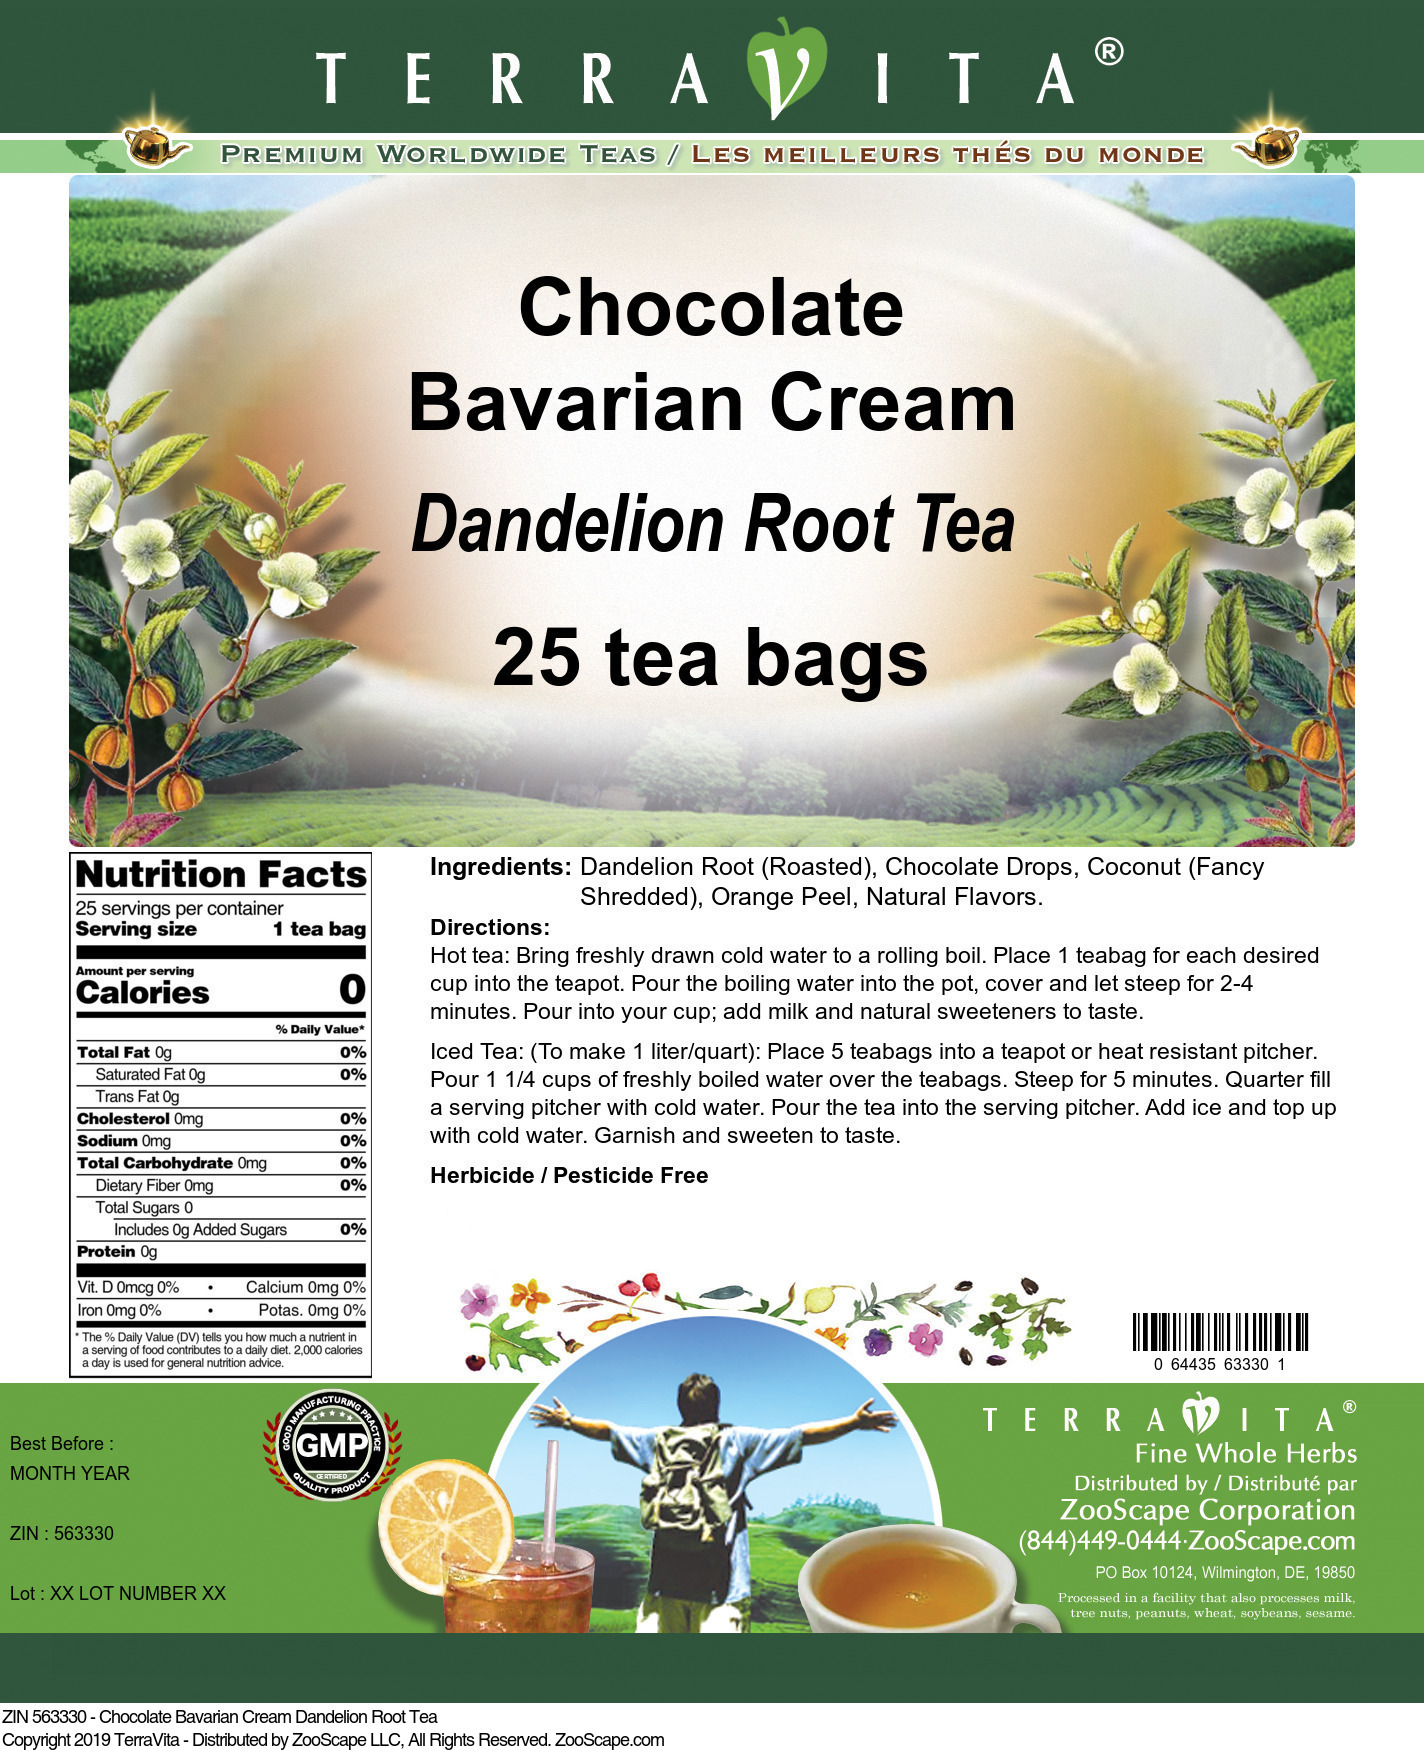 Chocolate Bavarian Cream Dandelion Root